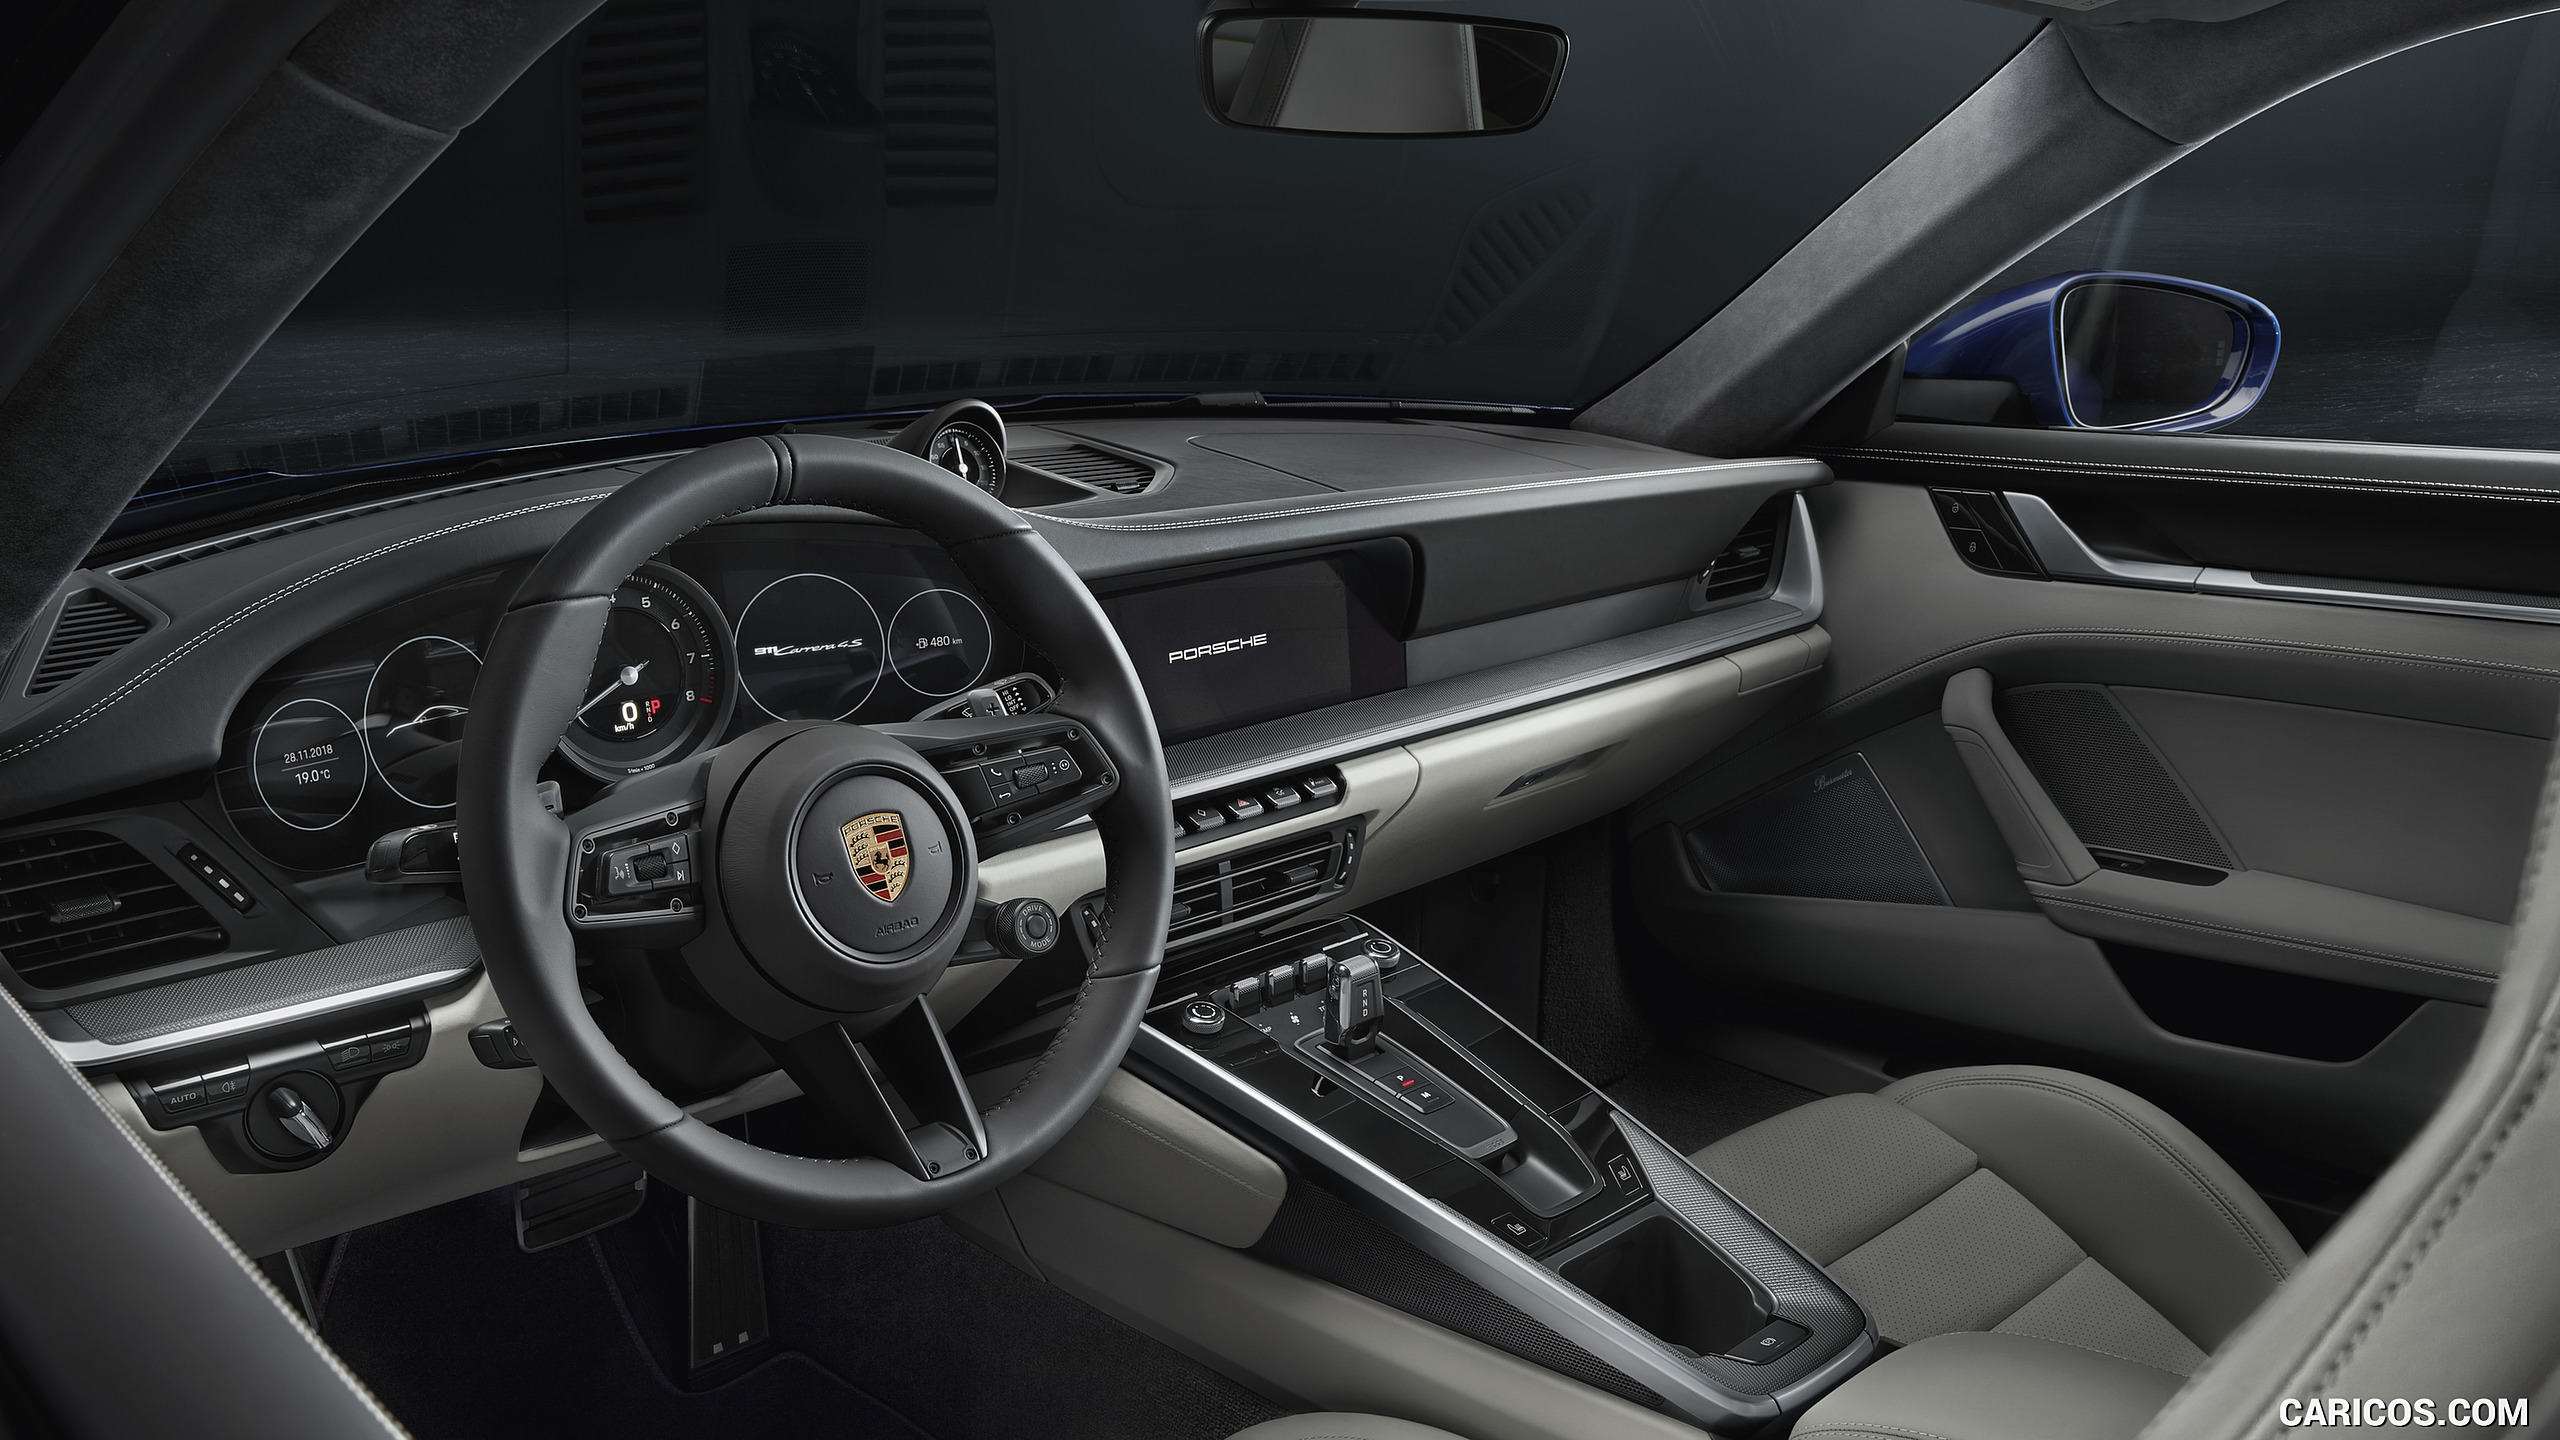 2020 Porsche 911 Carrera 4S   Interior HD Wallpaper 19 2560x1440